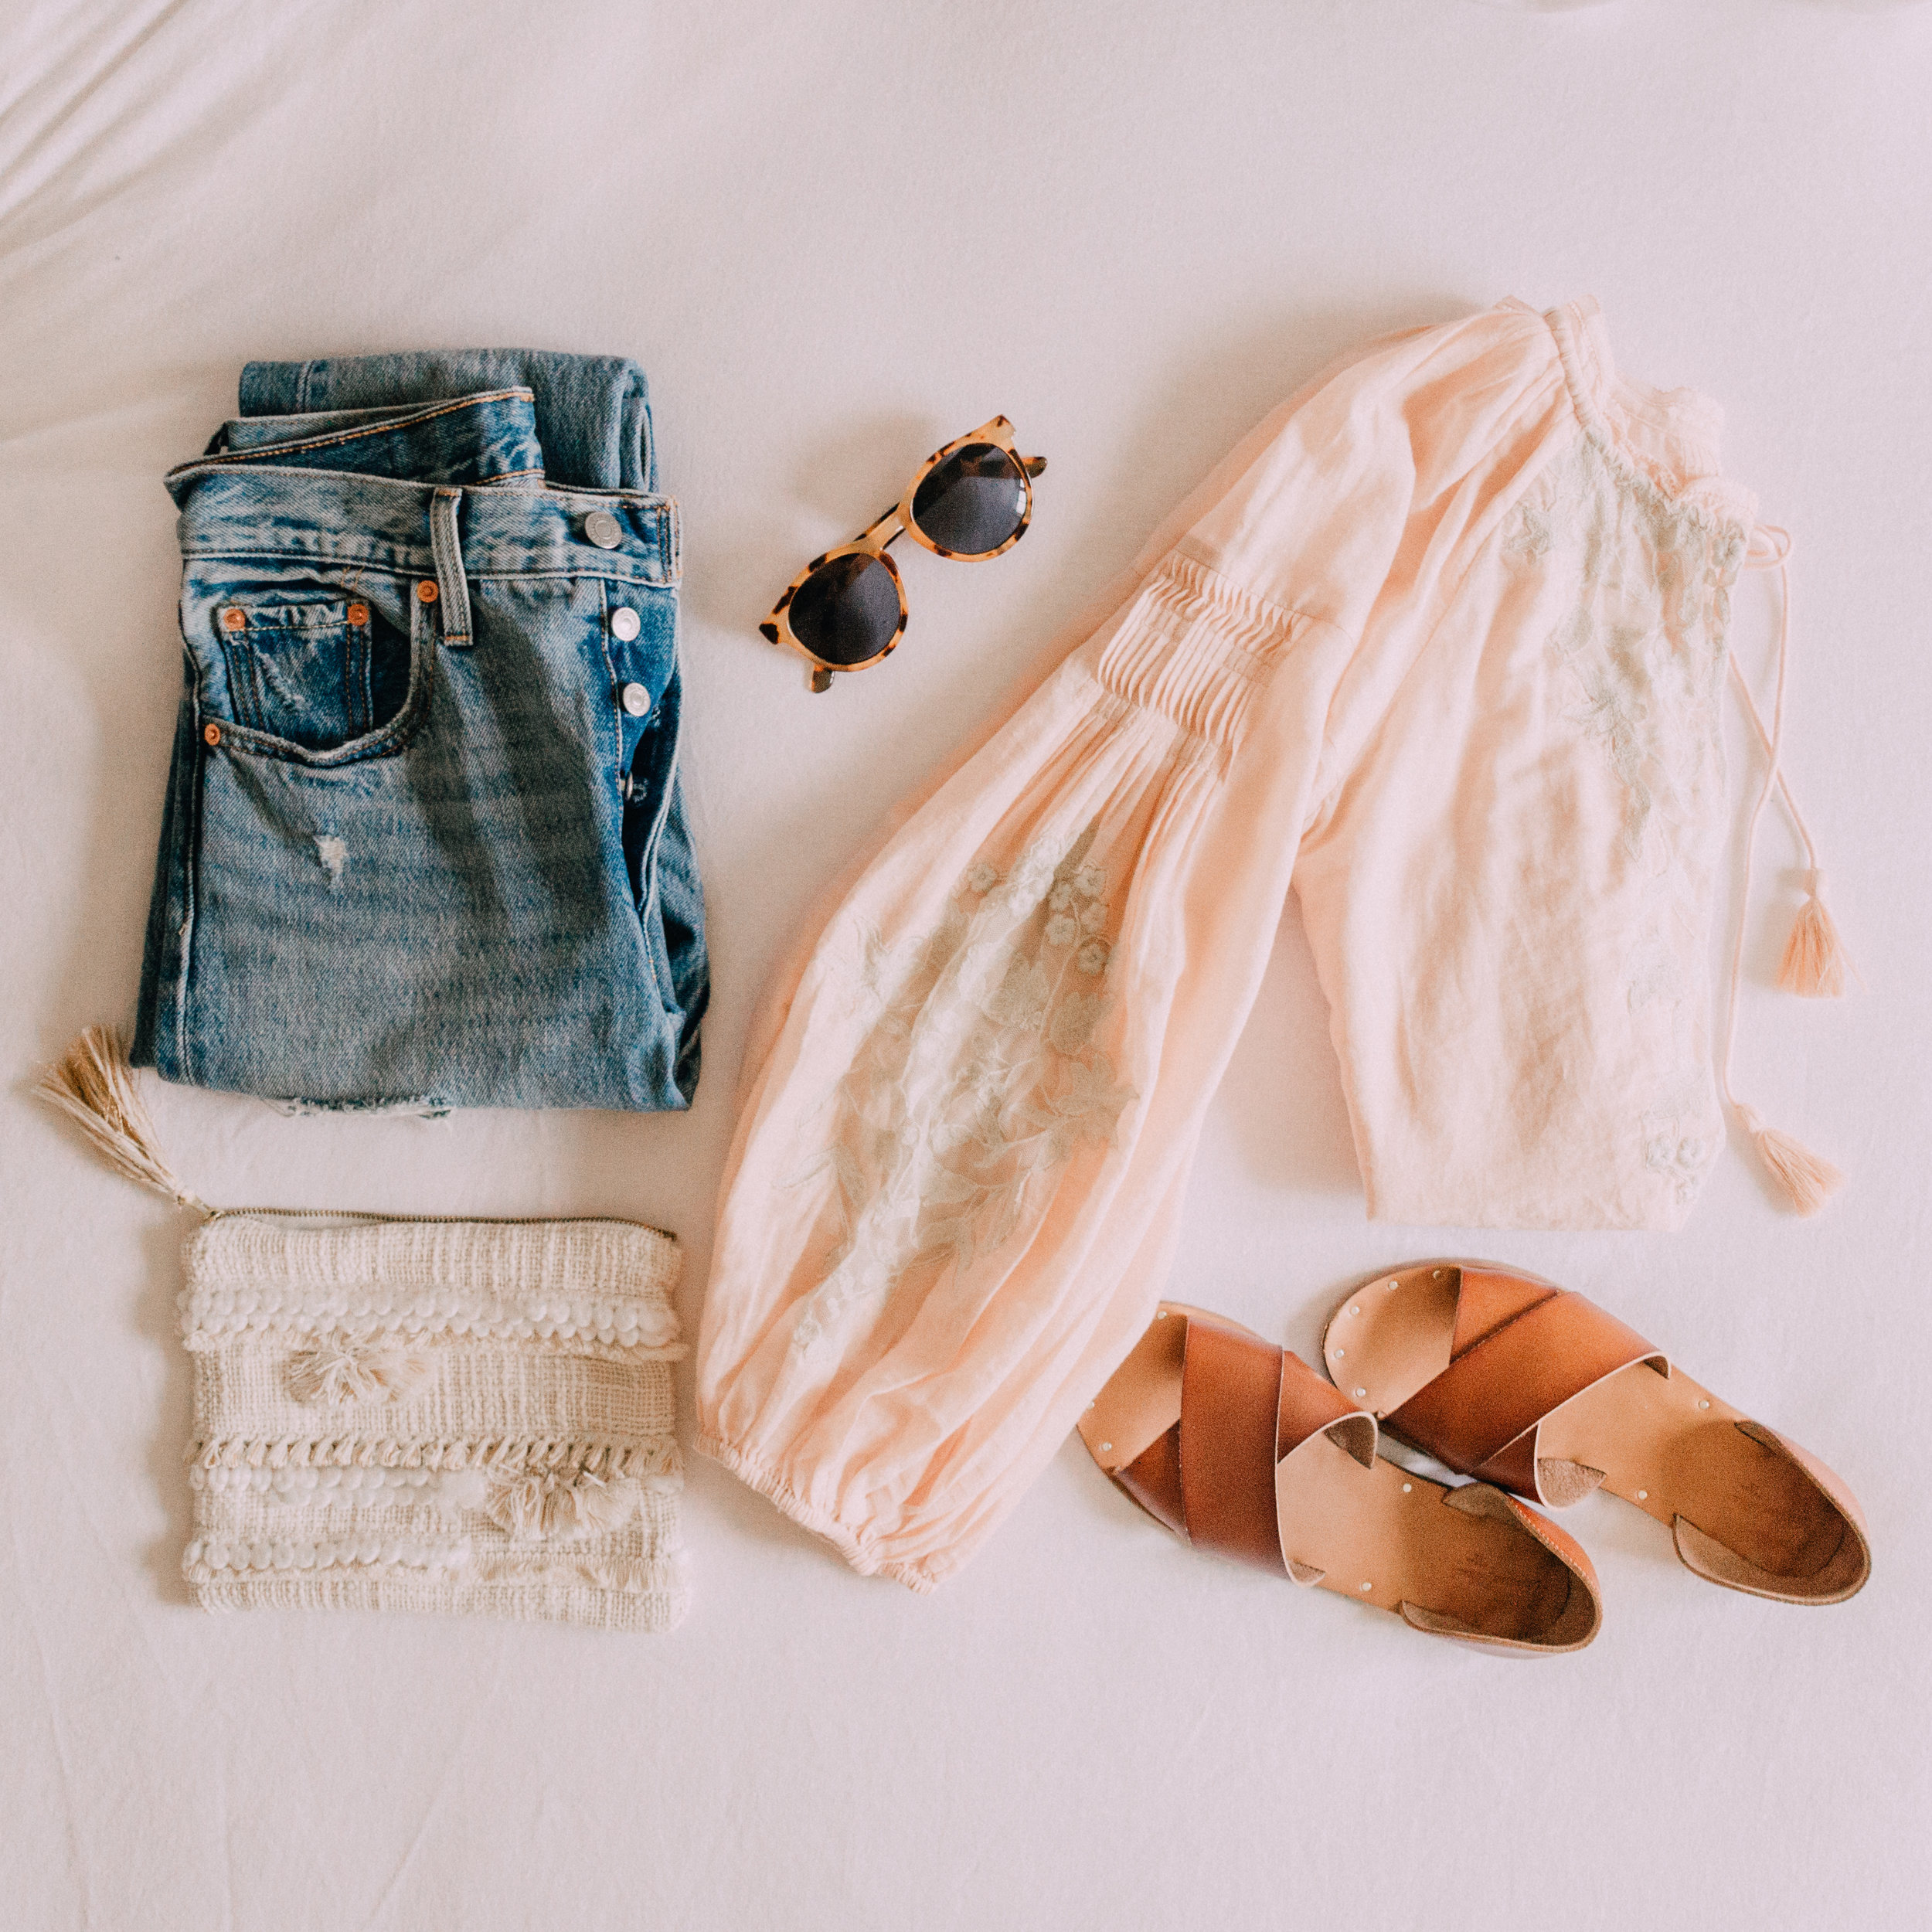 Shop My Closet -